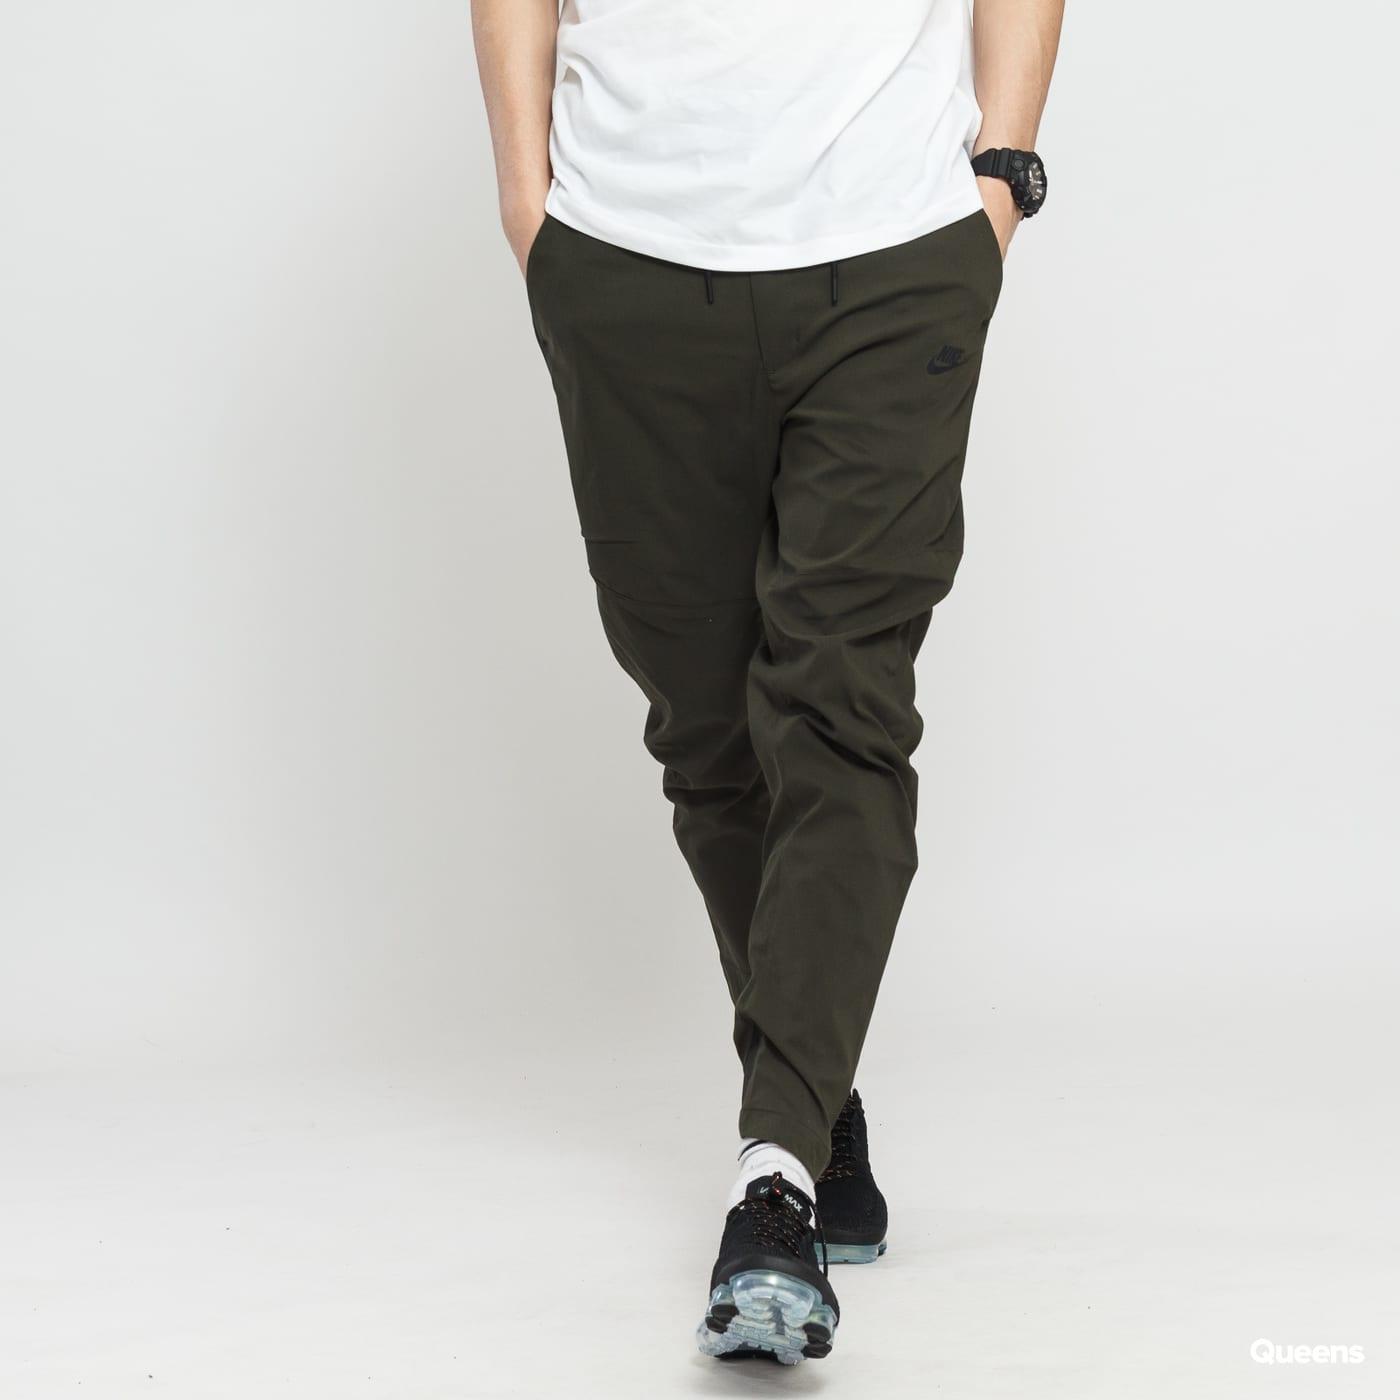 Nike M NSW PE Pant Woven Tech Strt dark olive